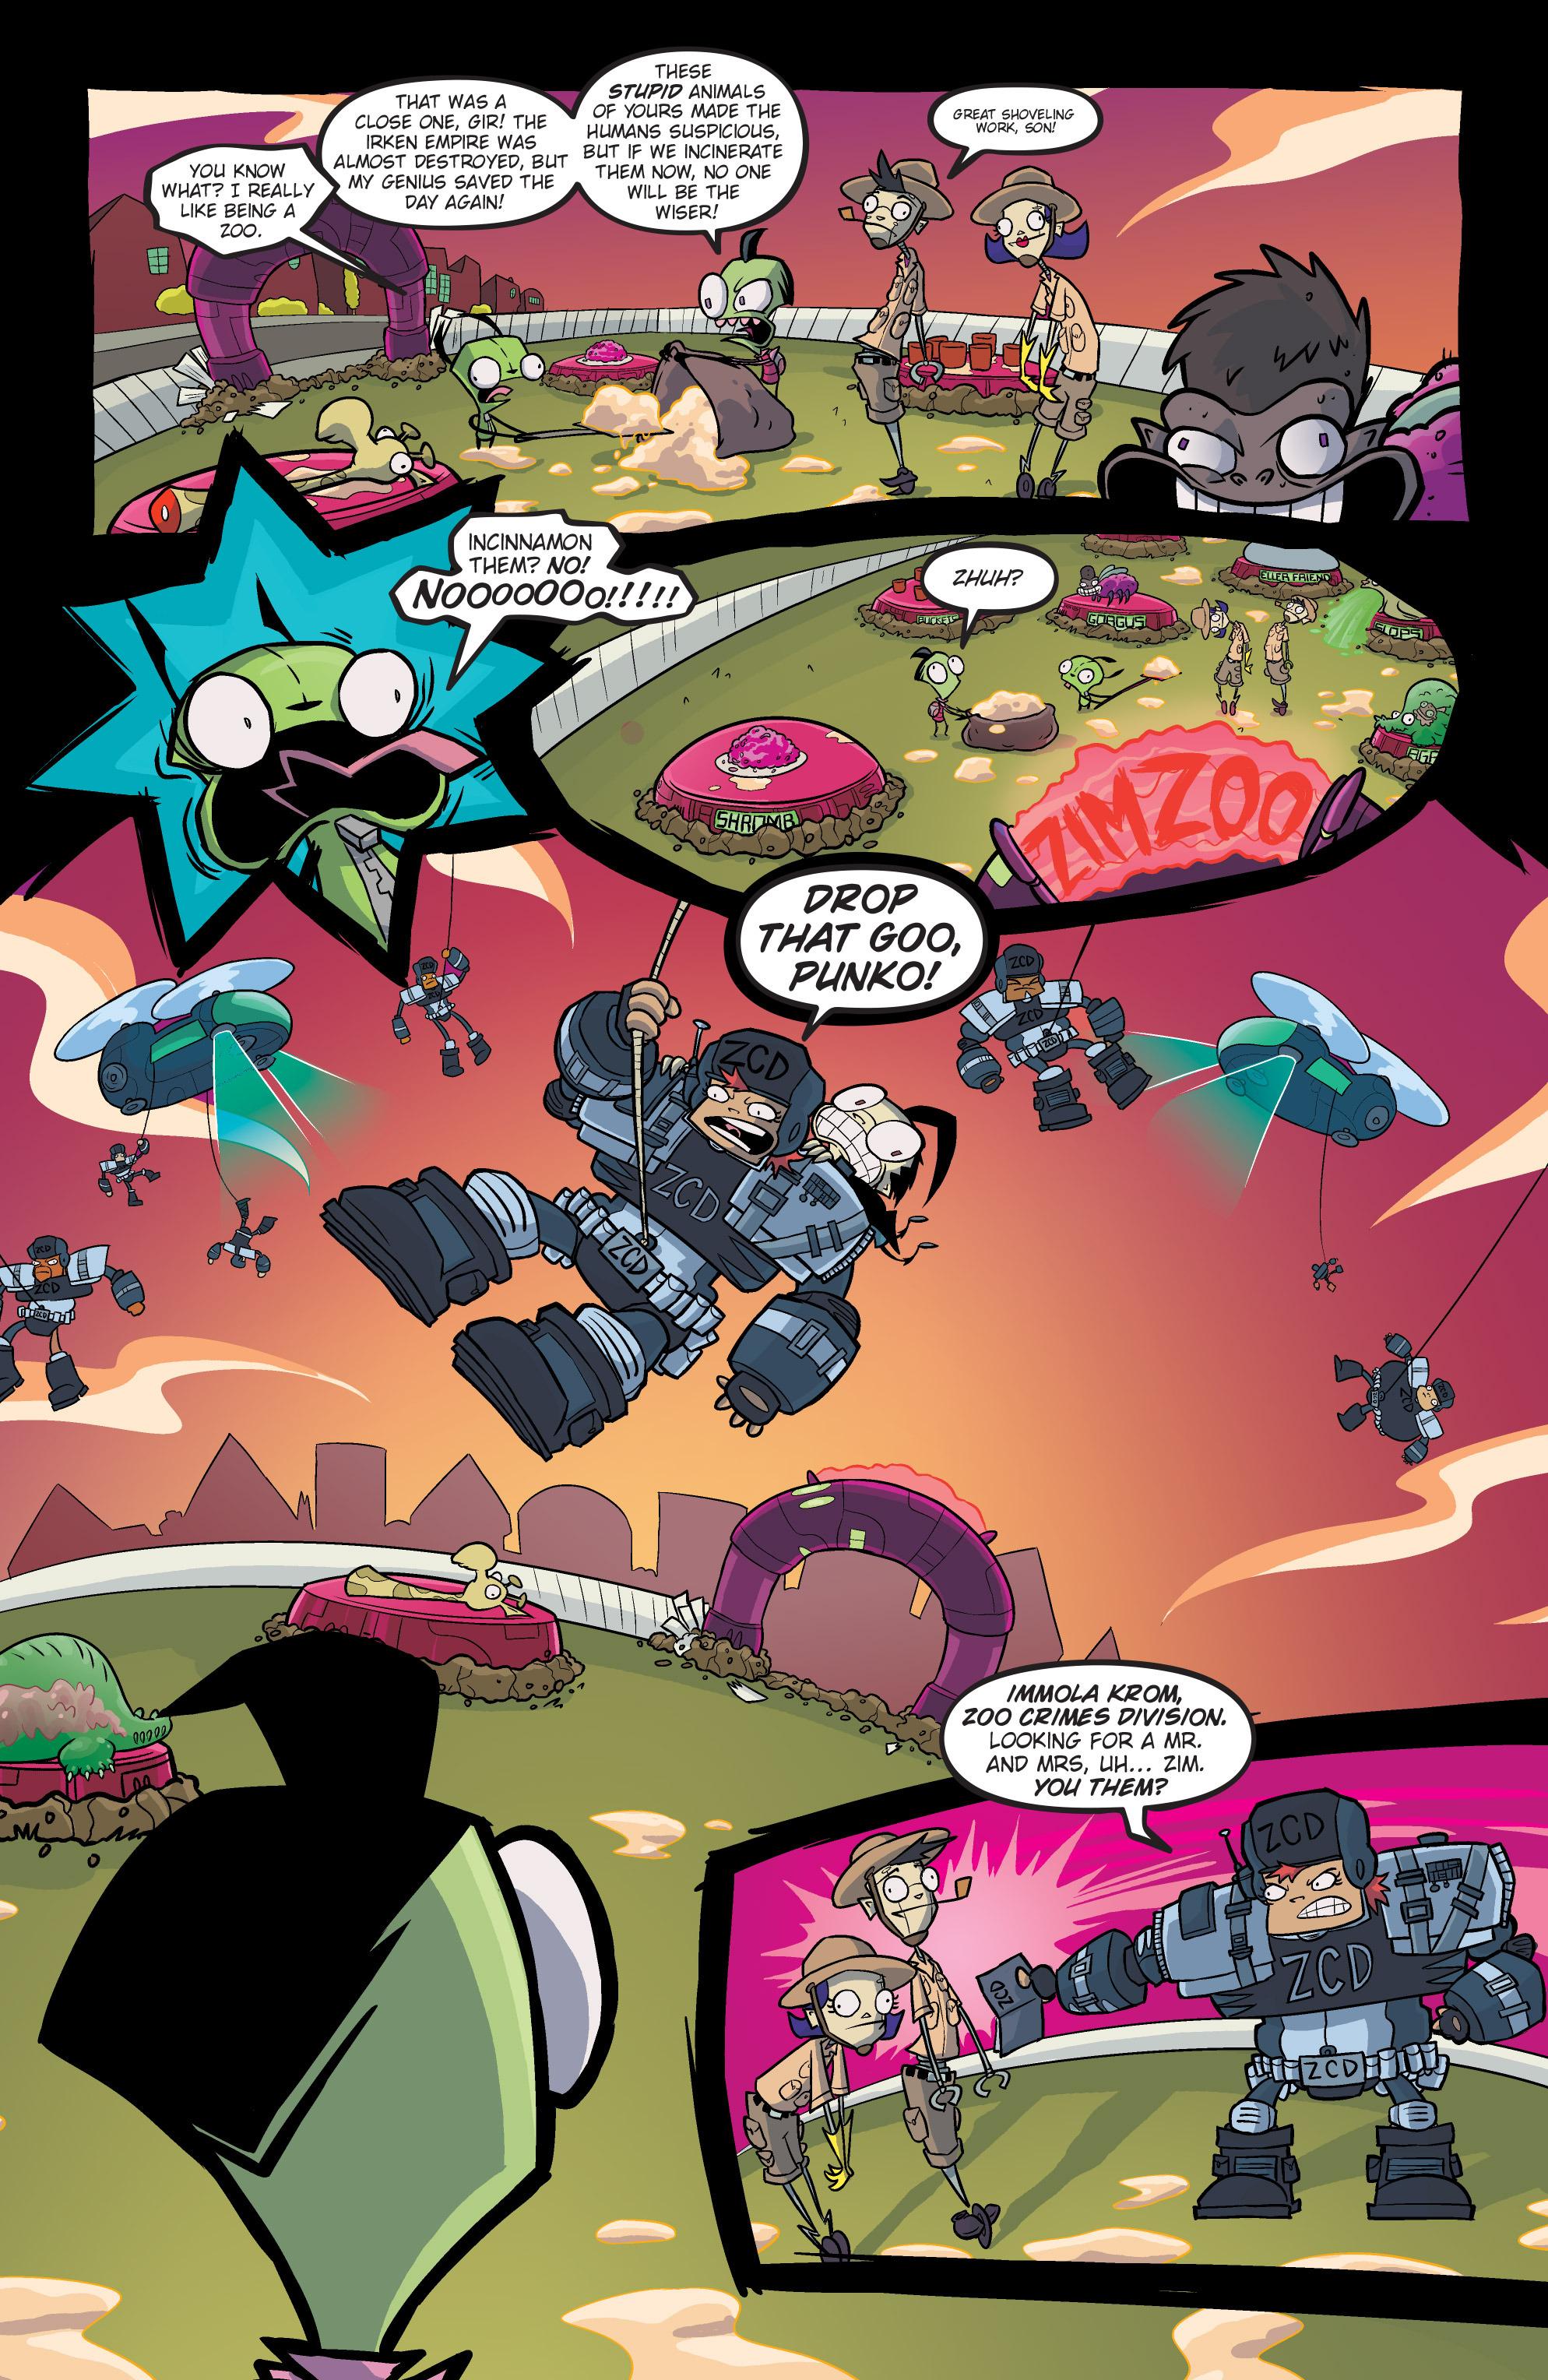 Read online Invader Zim comic -  Issue #19 - 13